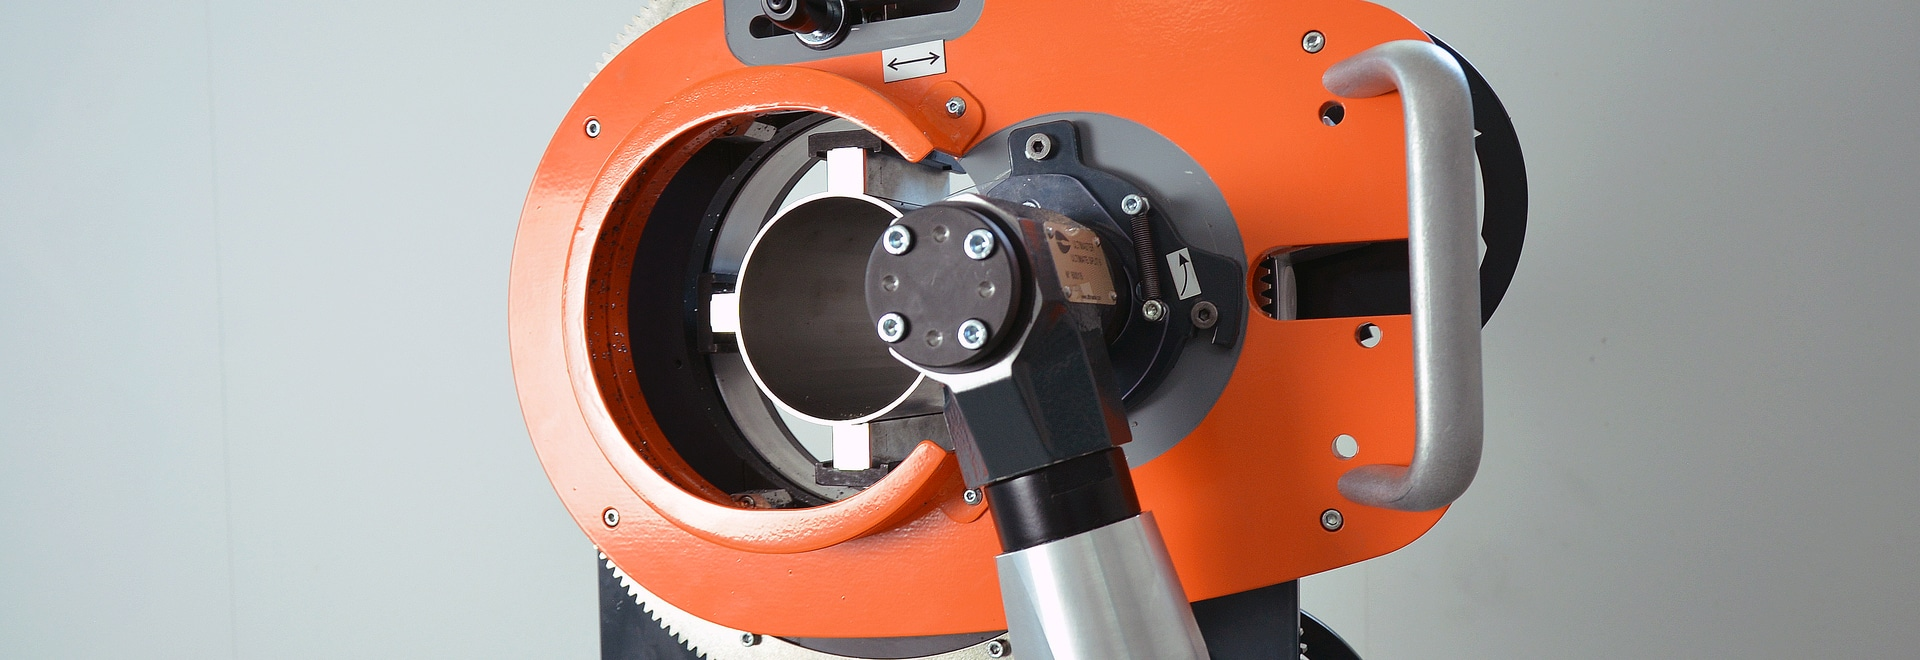 Orbital Tube Cutting Saw - US6